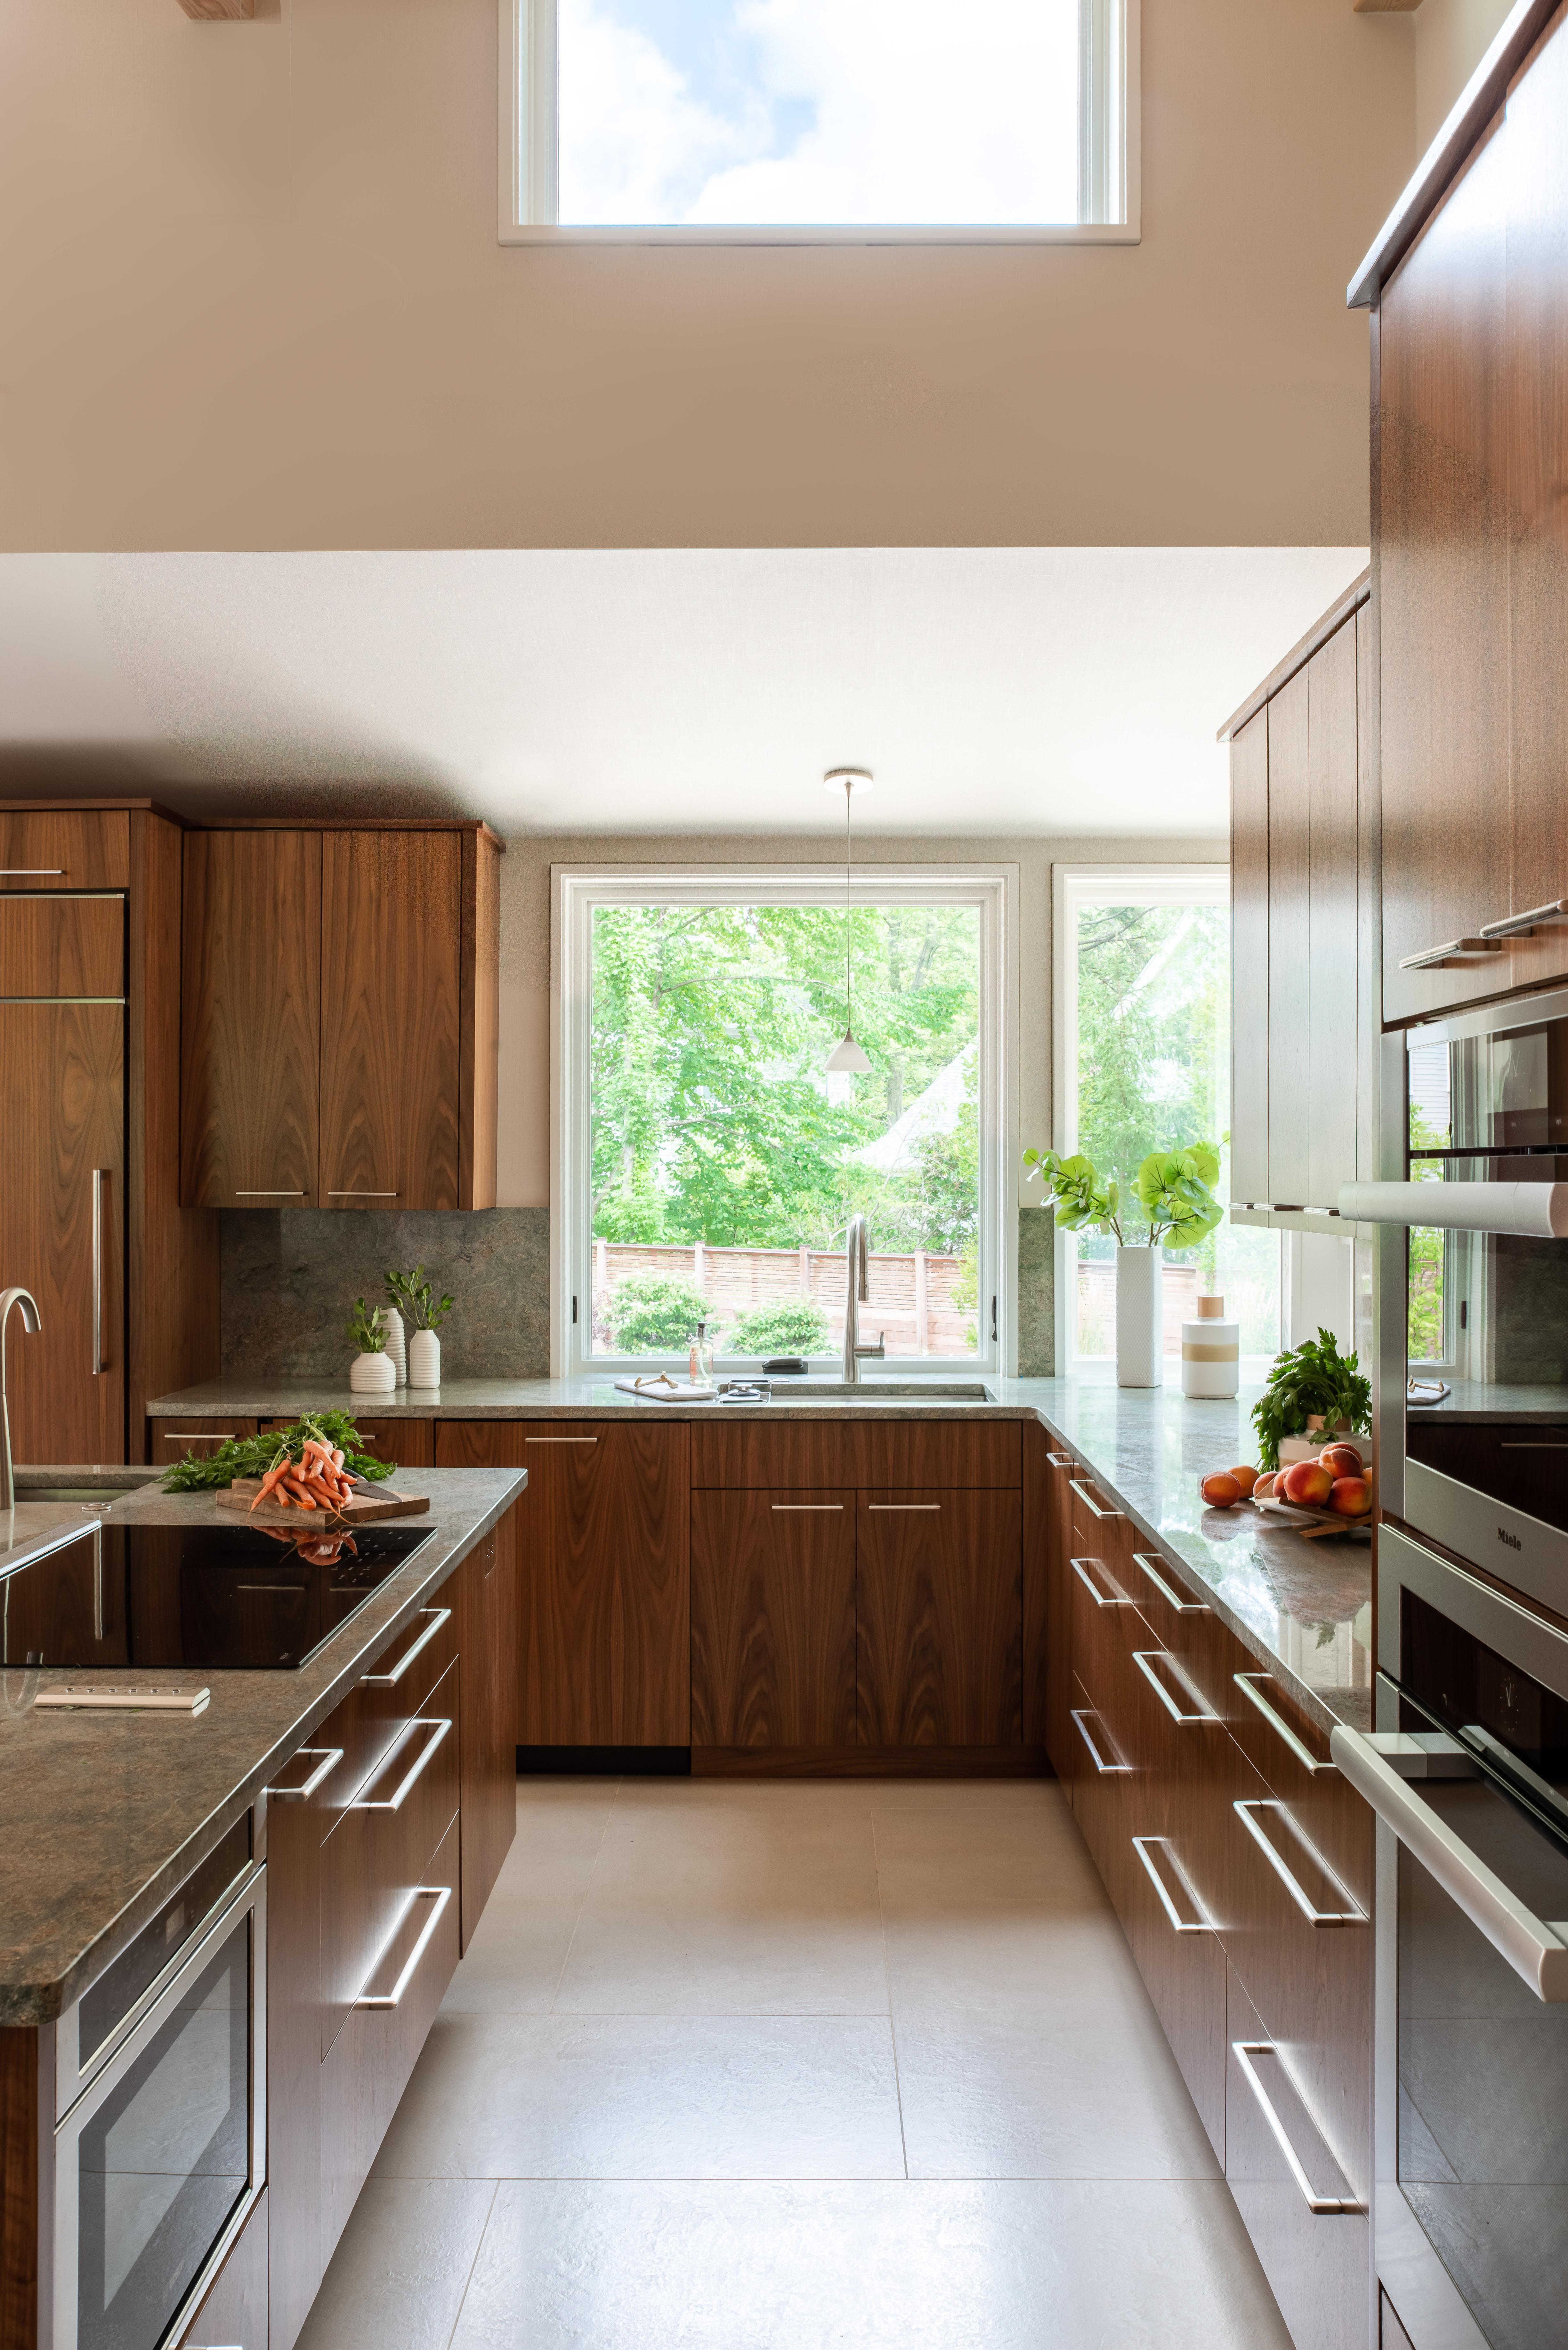 SLR Dudley kitchen renovations modern new construction